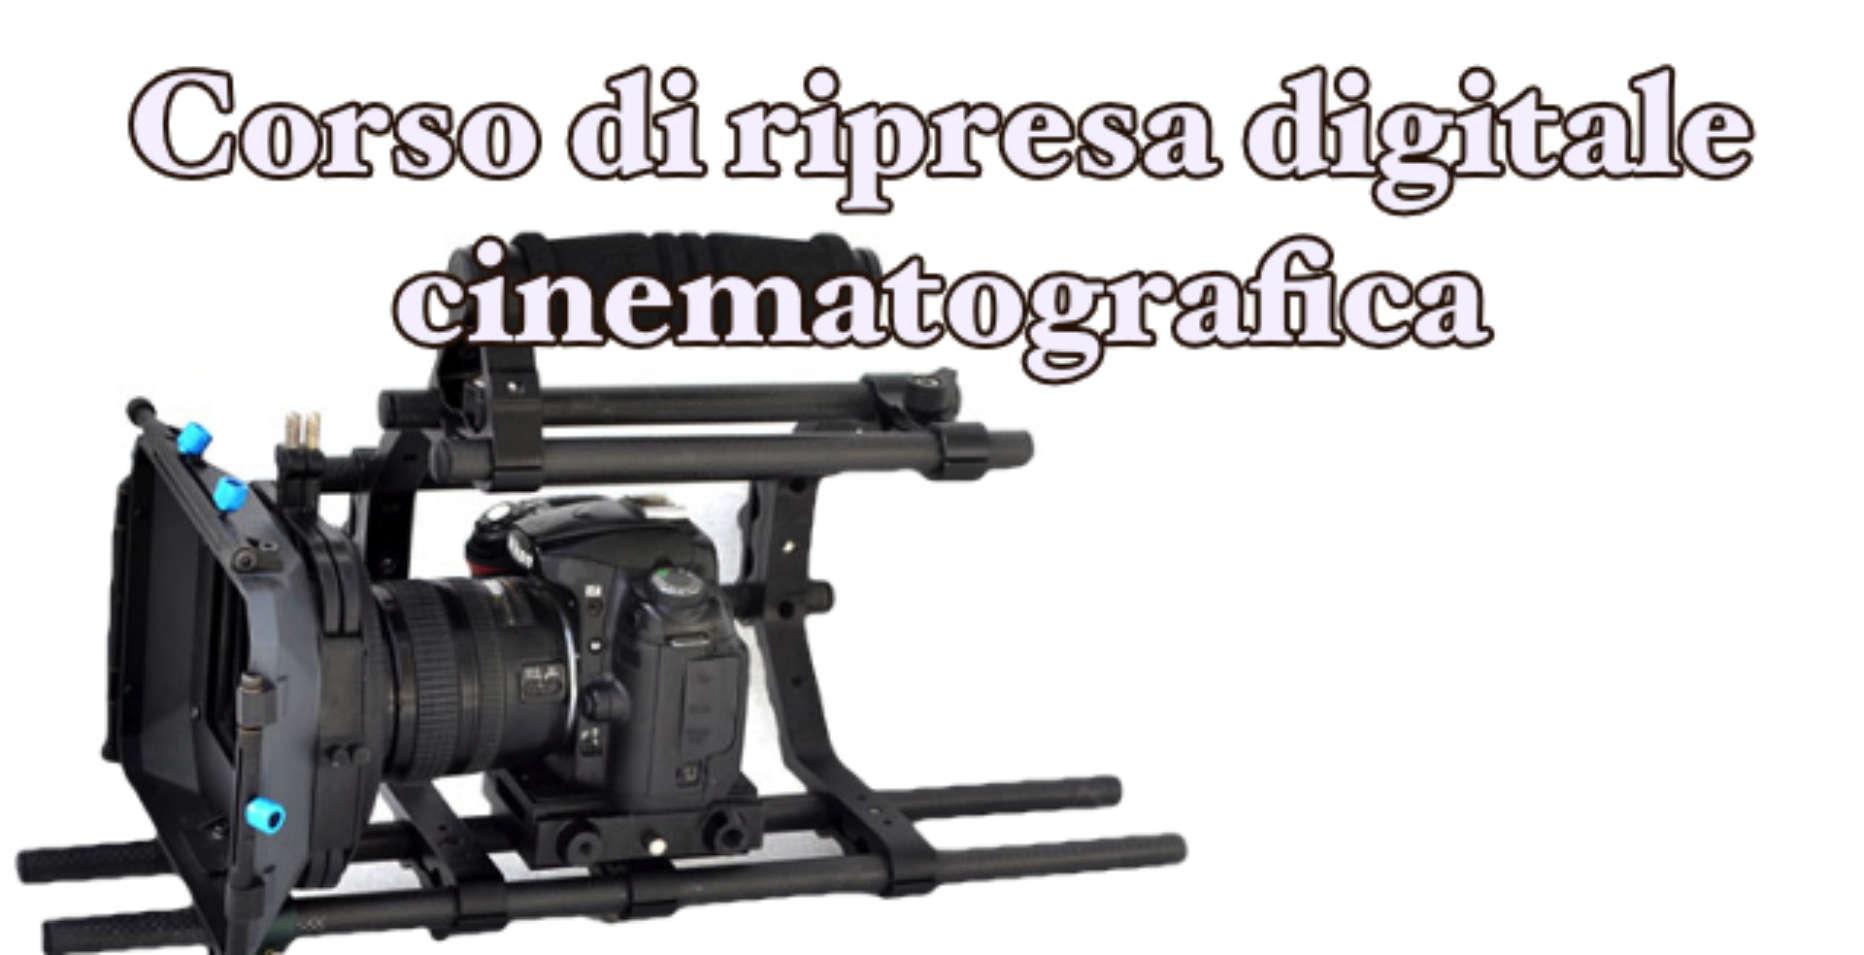 RIPRESA DIGITALE CINEMATOGRAFICA